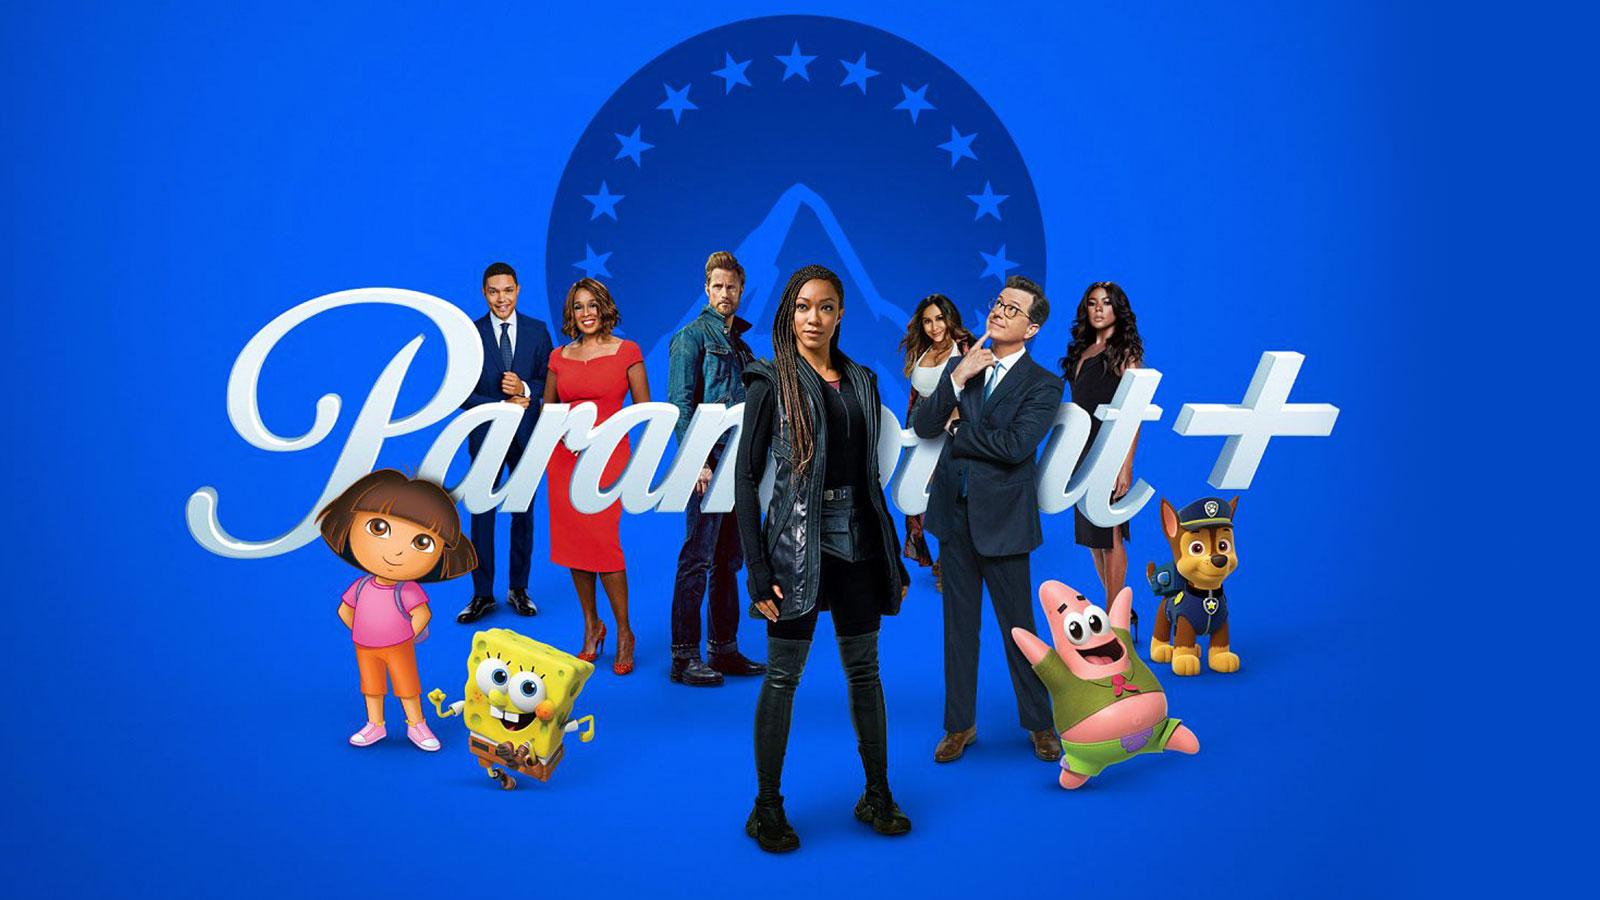 Paramount Plus To Launch Cheaper $5 Plan Next Week